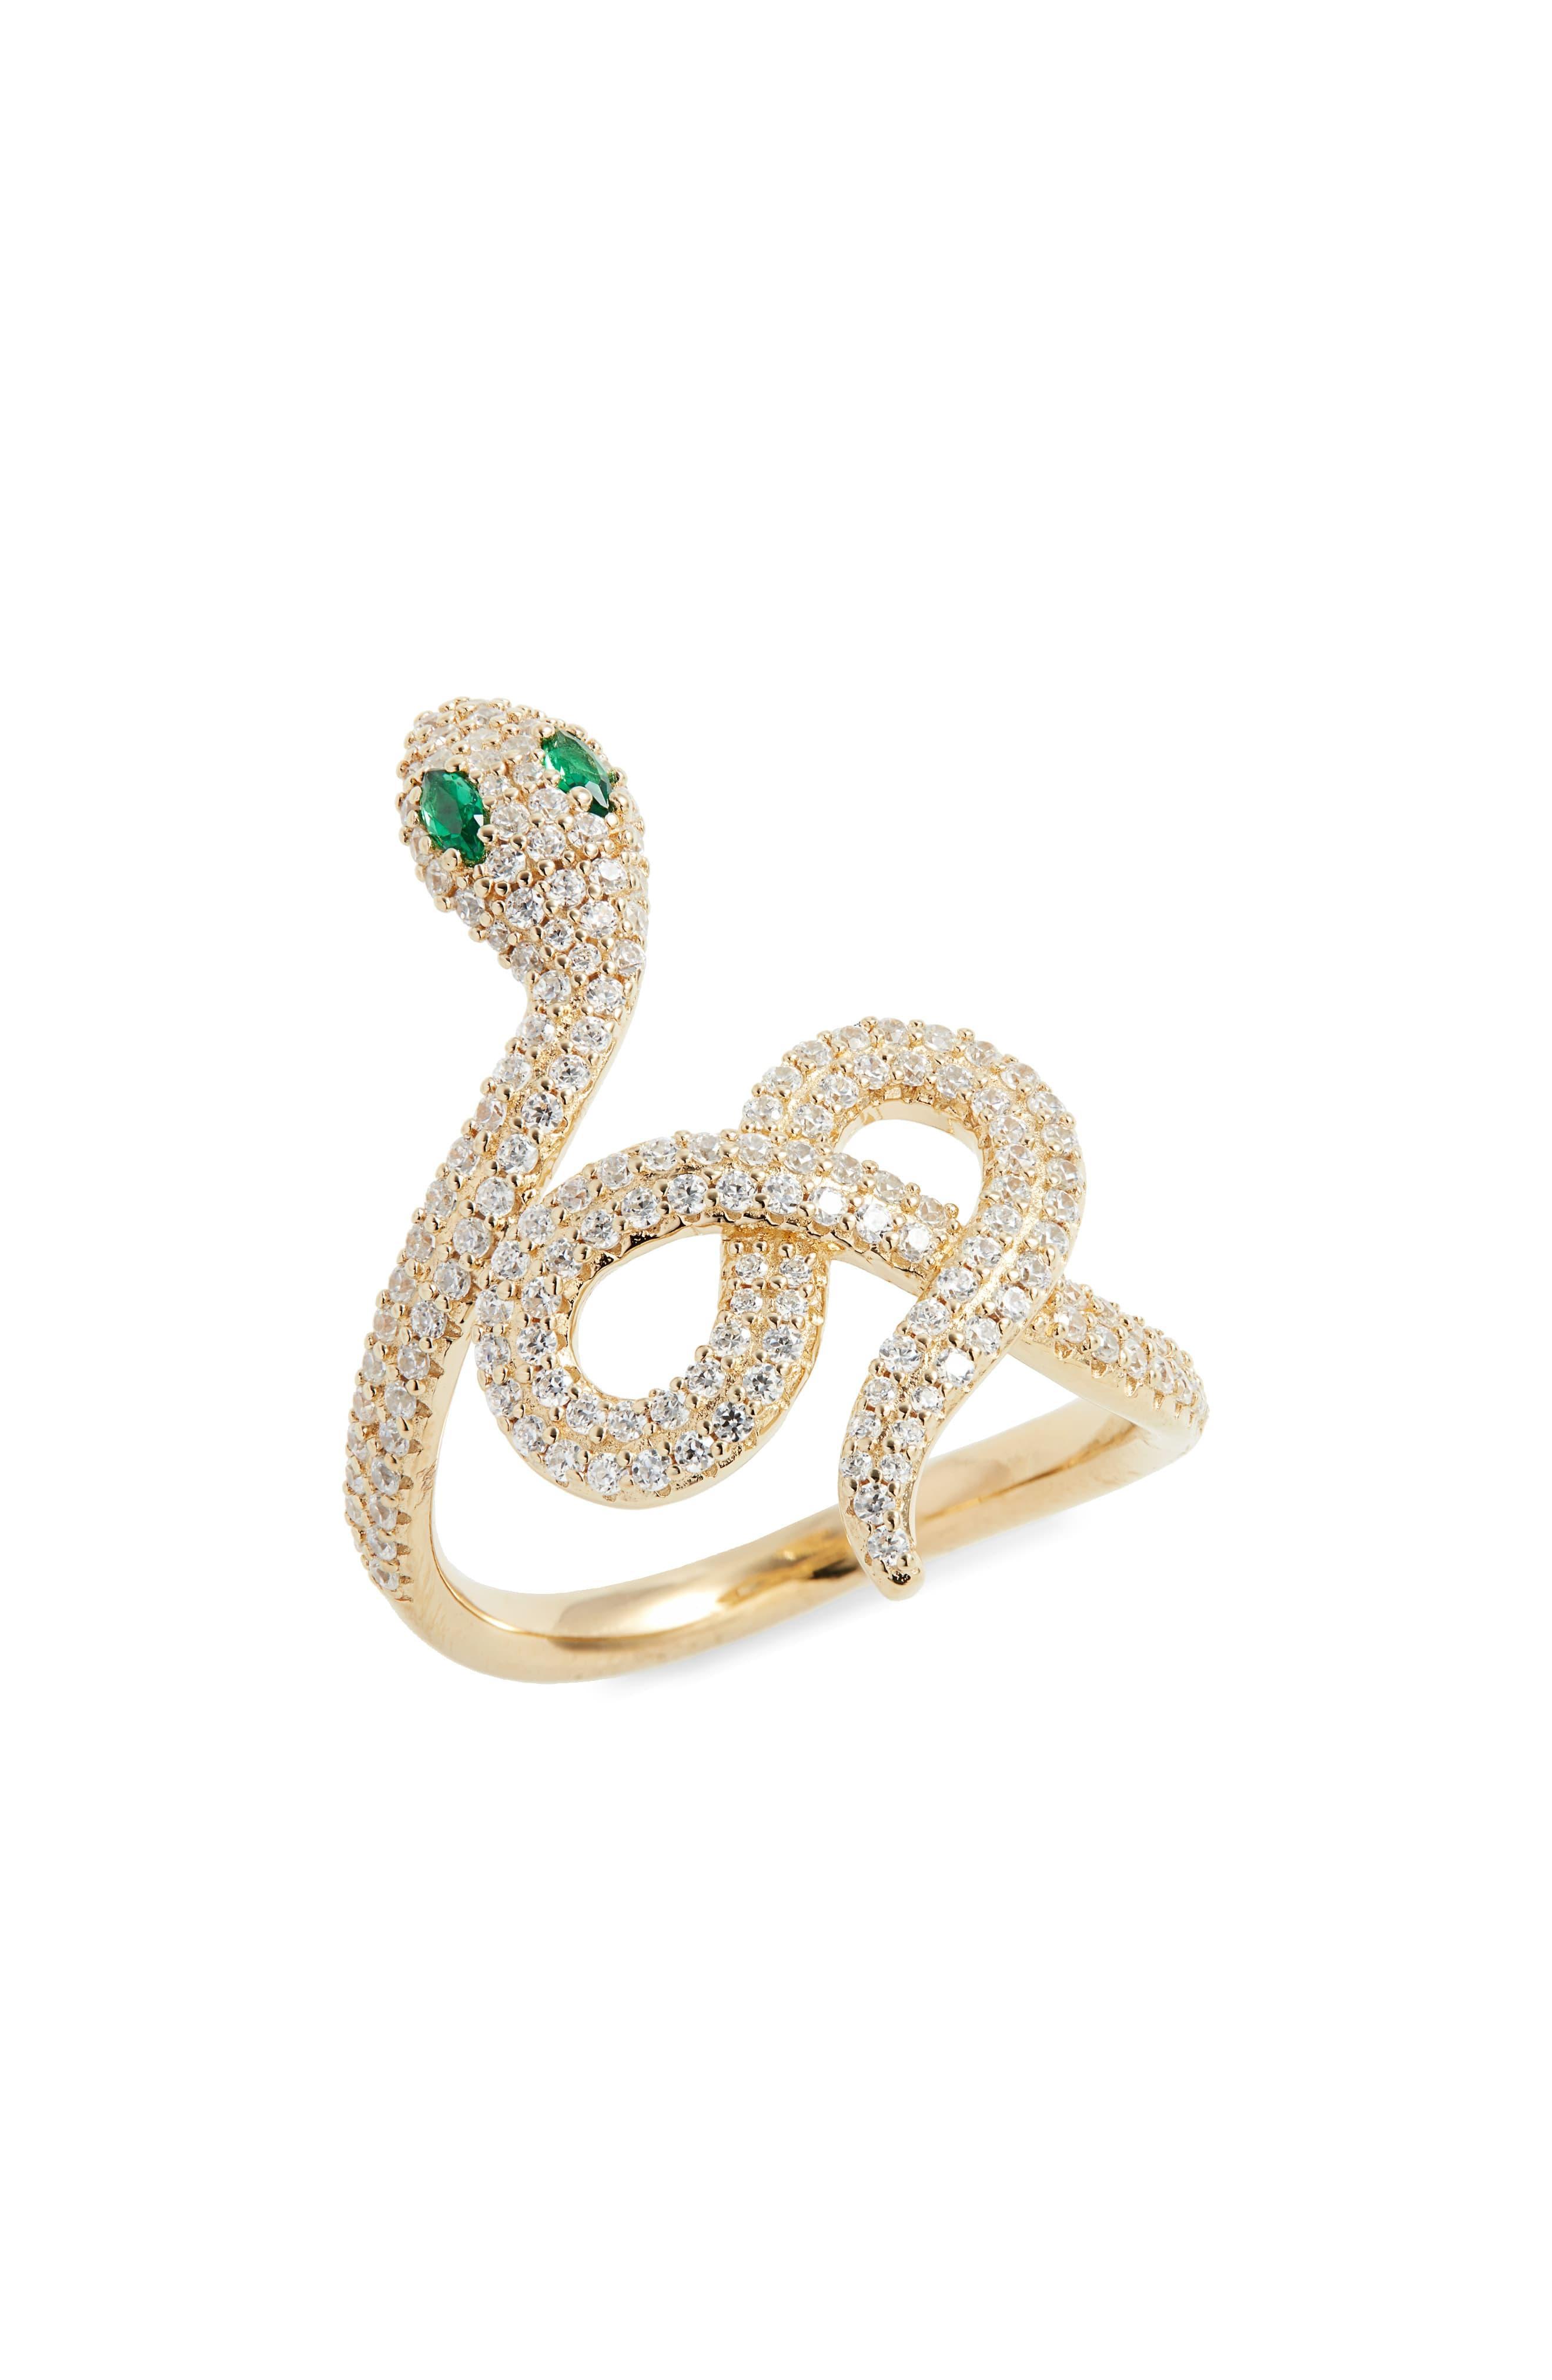 Monaco Luxury Ring EGYPTIAN TRIBUTE Snake Green S925 Cubic Zirconia